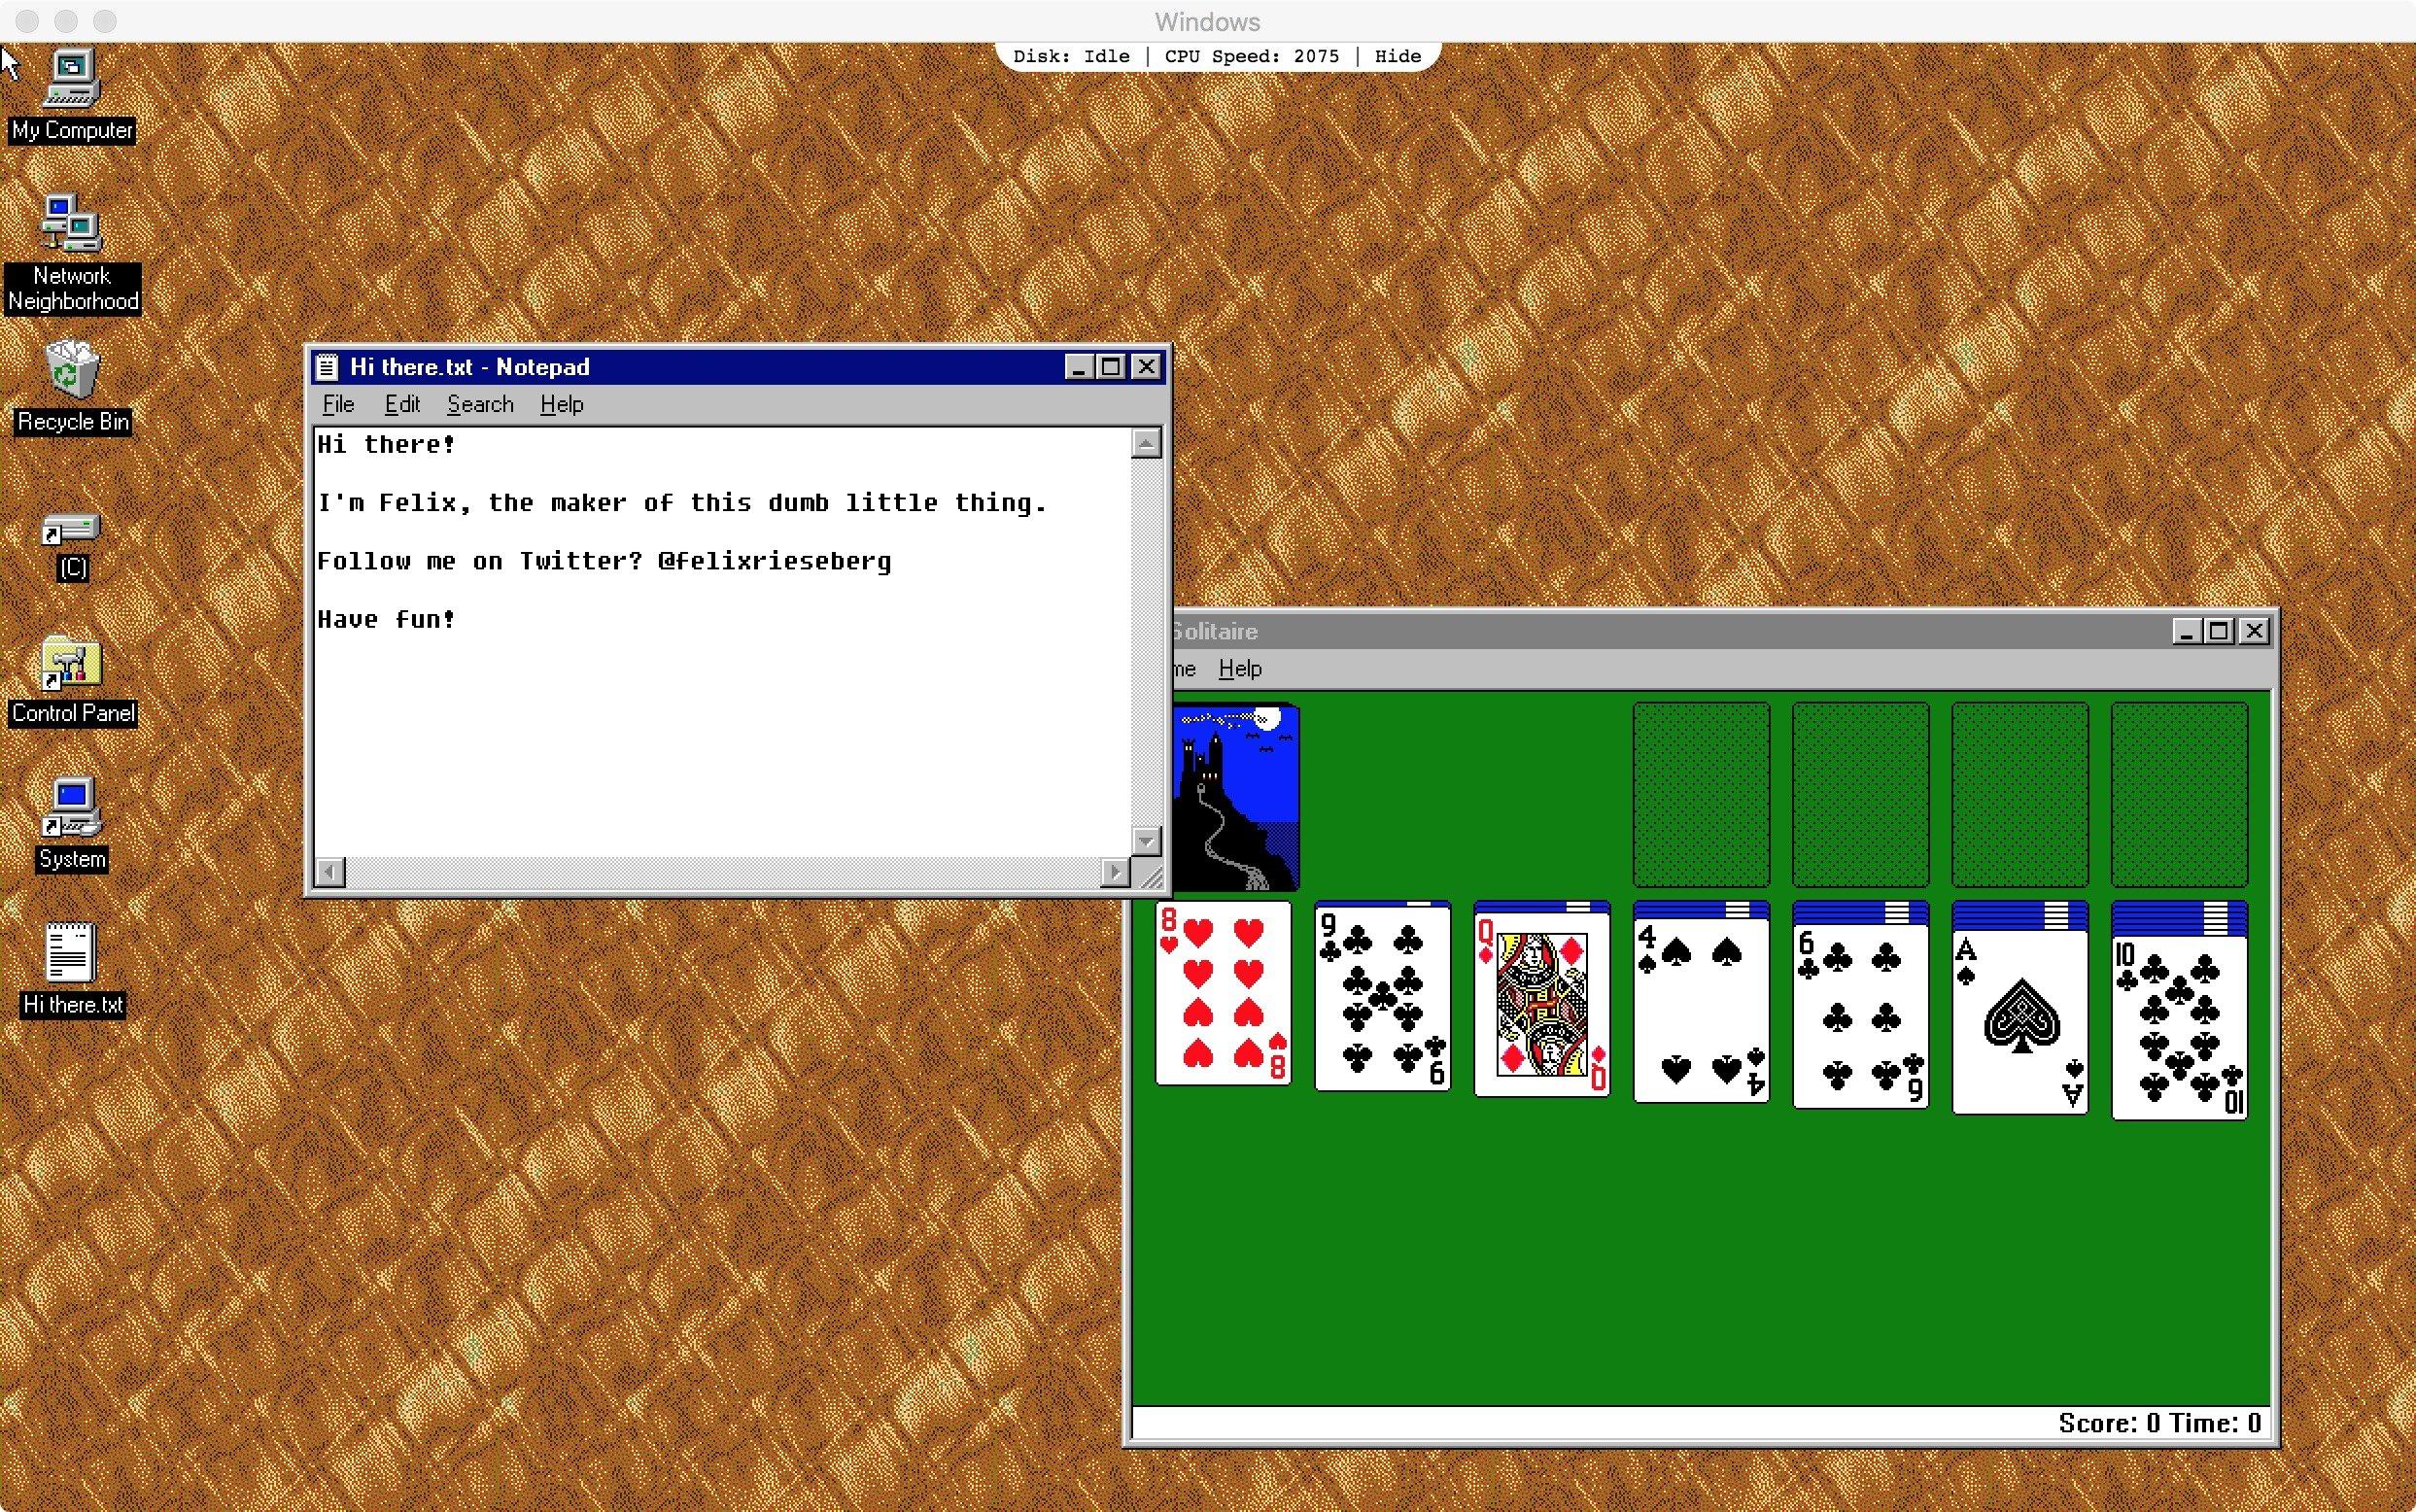 Very retro: Try Windows 95 as an app on macOS - mac&egg